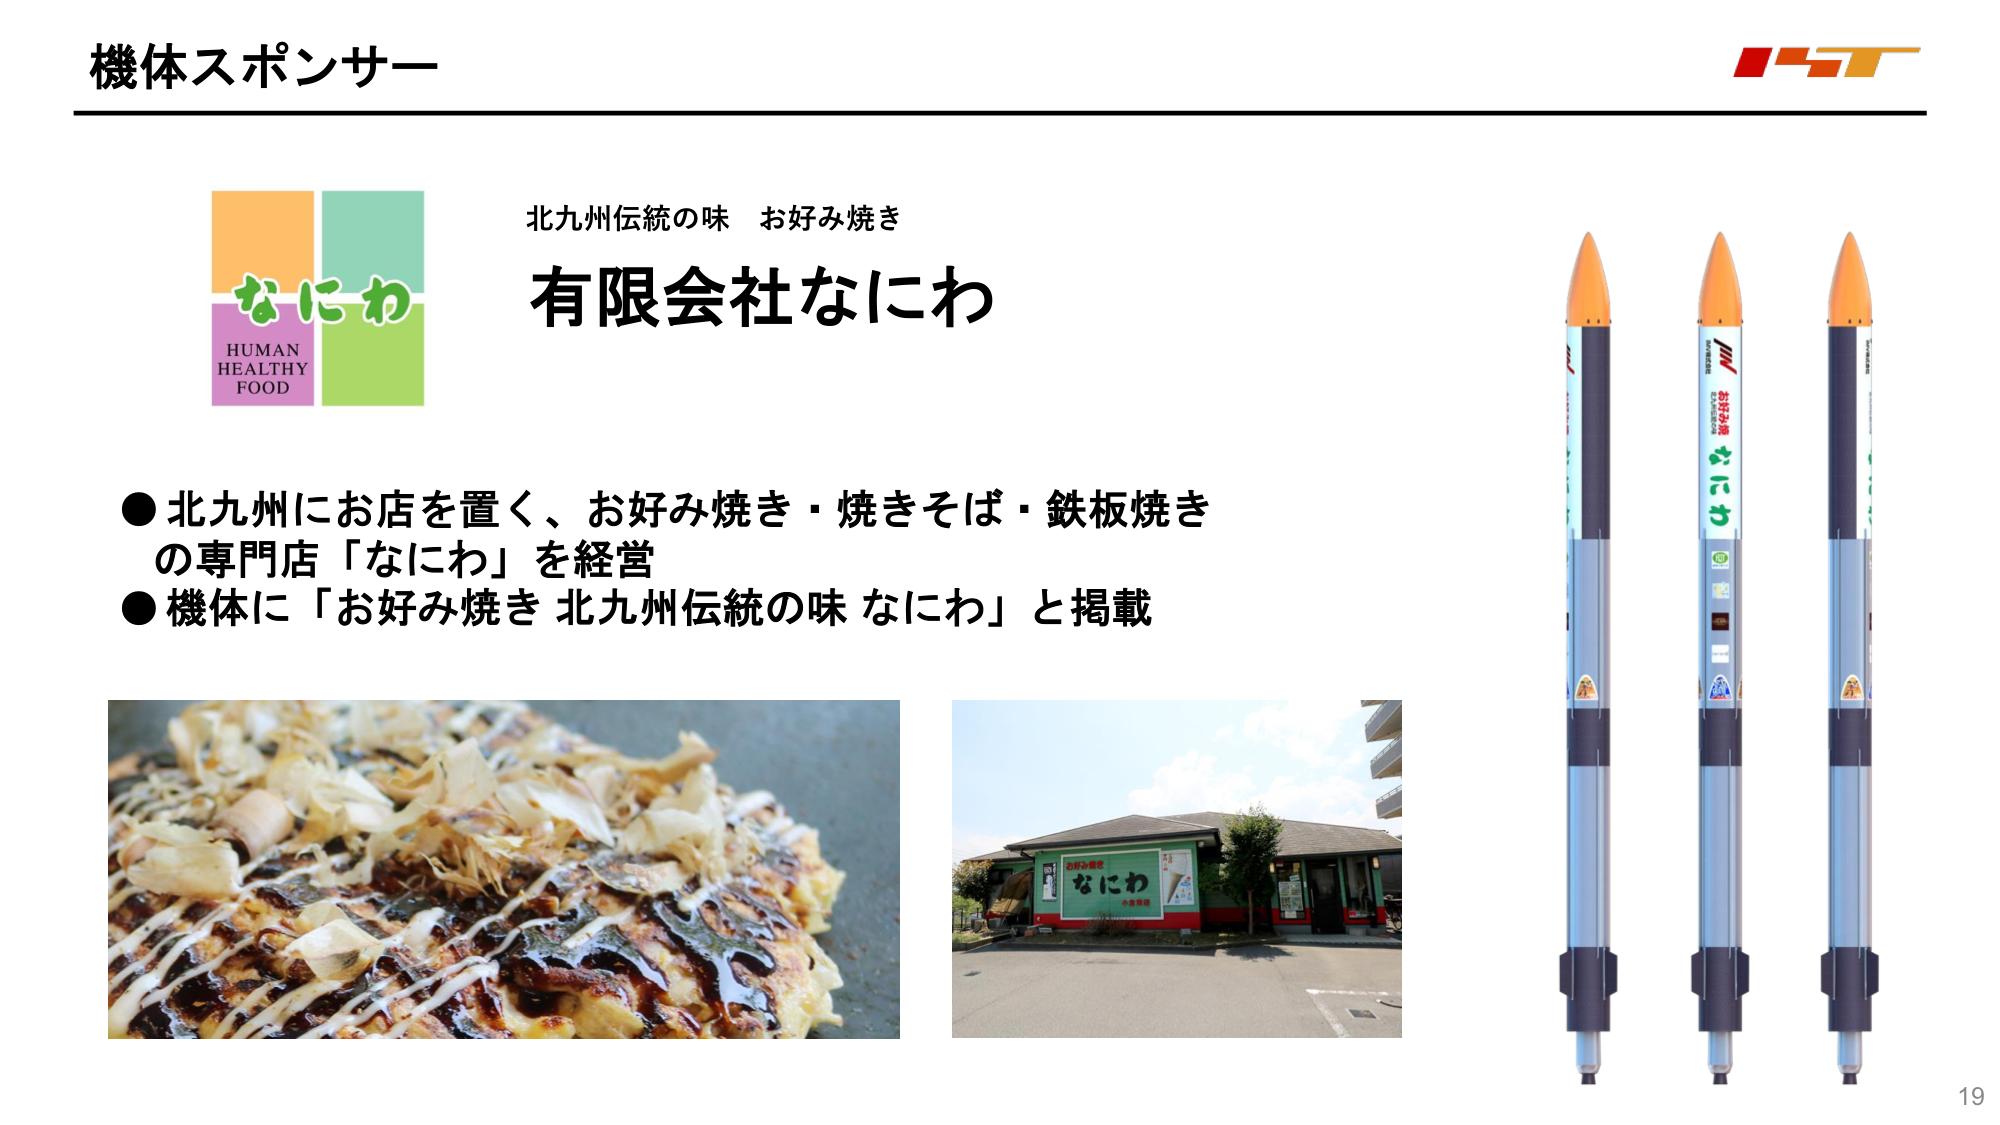 f:id:Imamura:20191126135155p:plain